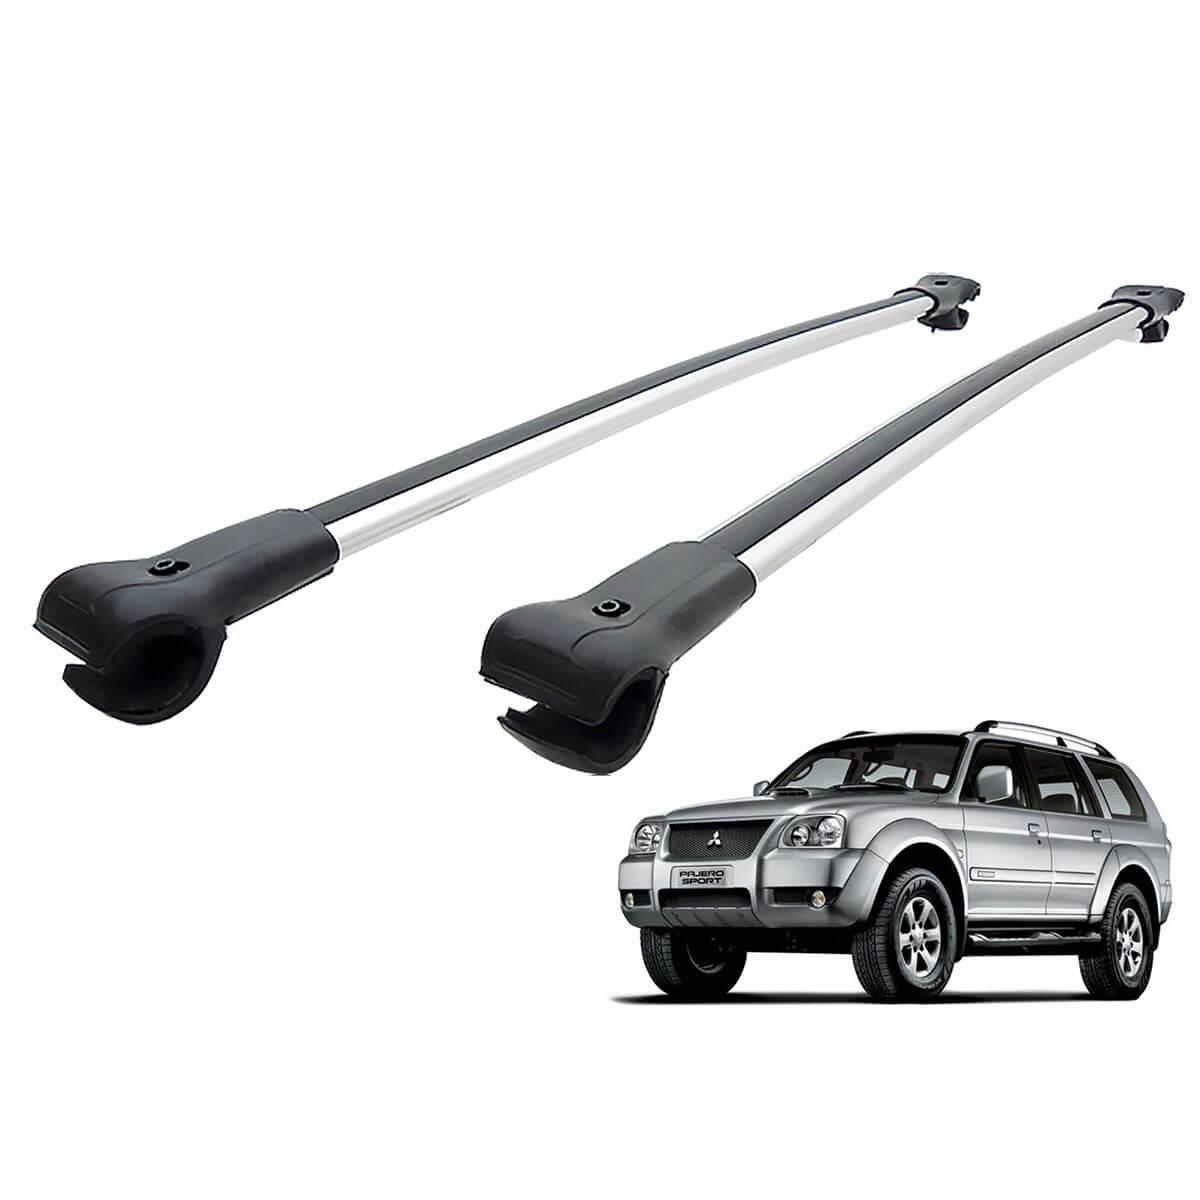 Travessa rack de teto larga alumínio Pajero Sport 2007 a 2011